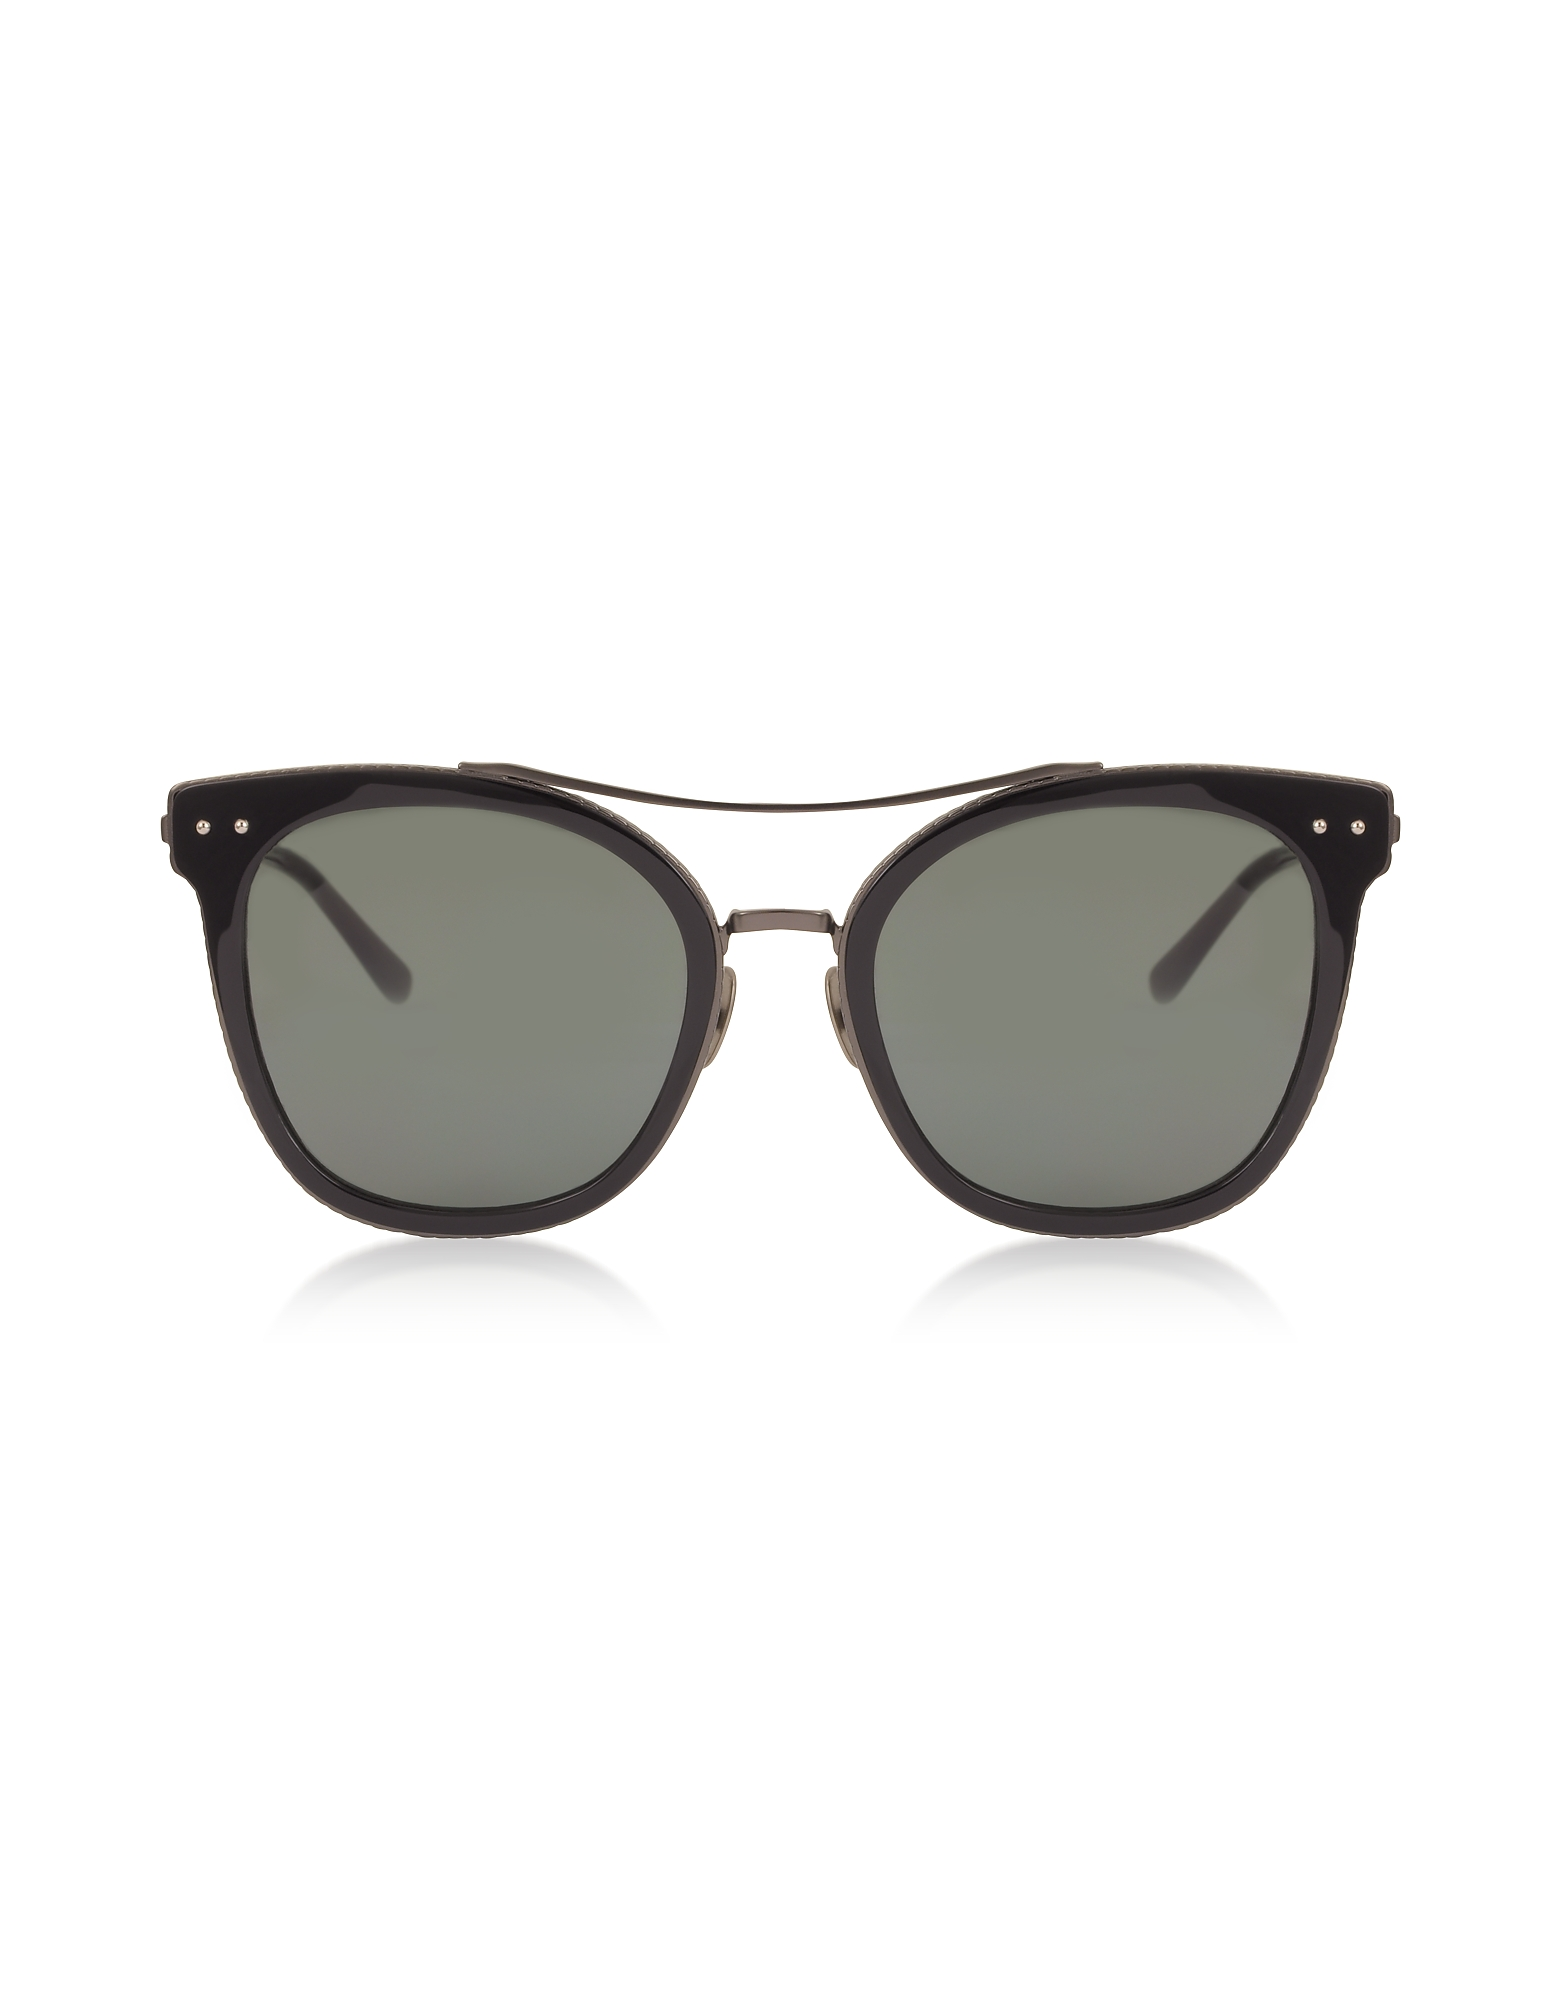 BV0064S 001 Black Metal Women's Sunglasses